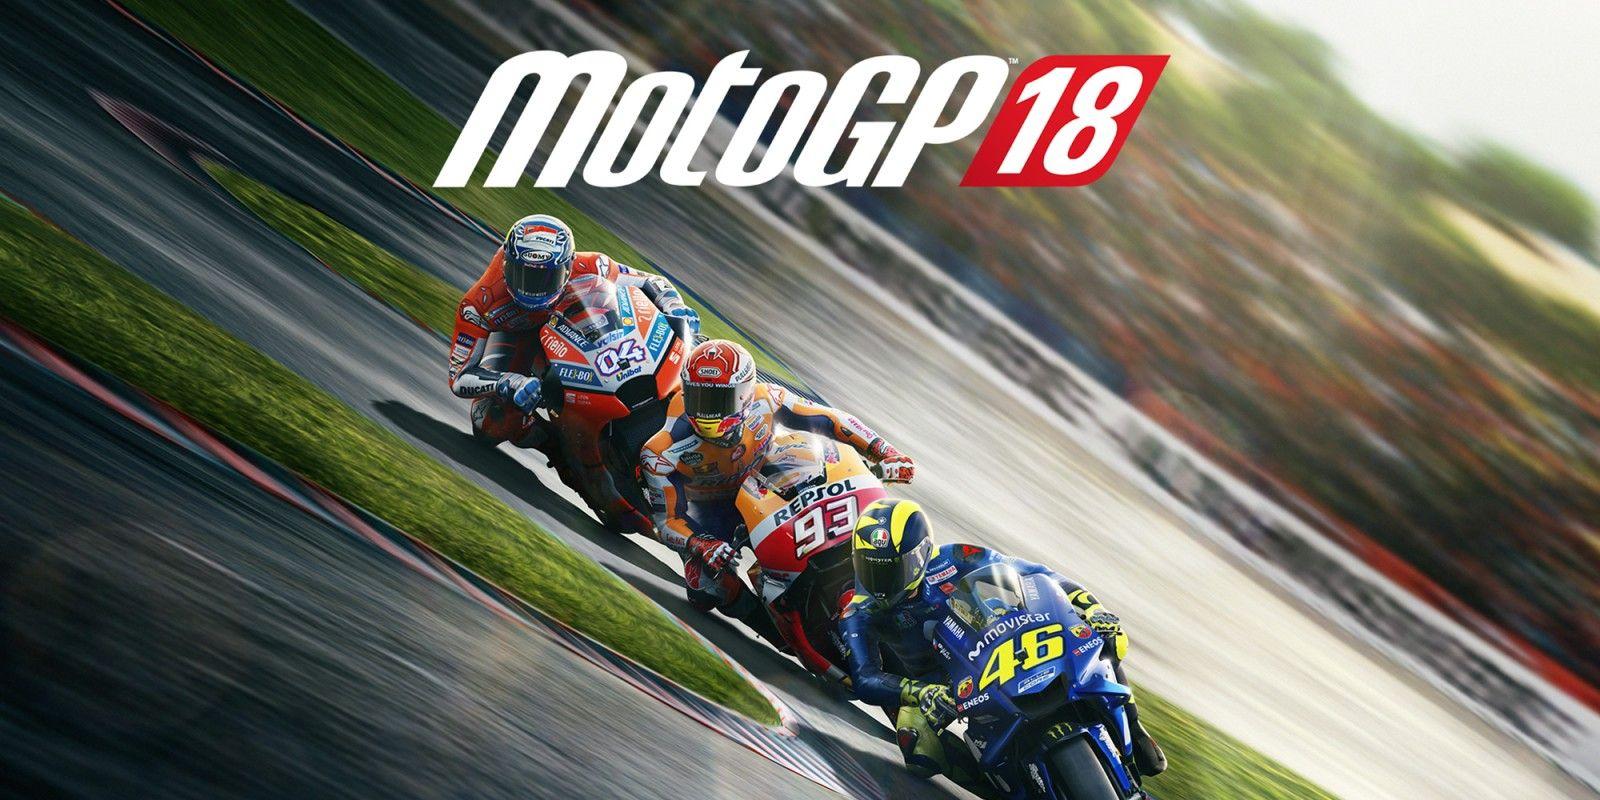 [Nintendo Switch] MotoGP 18 - £2.24 @ Nintendo eshop